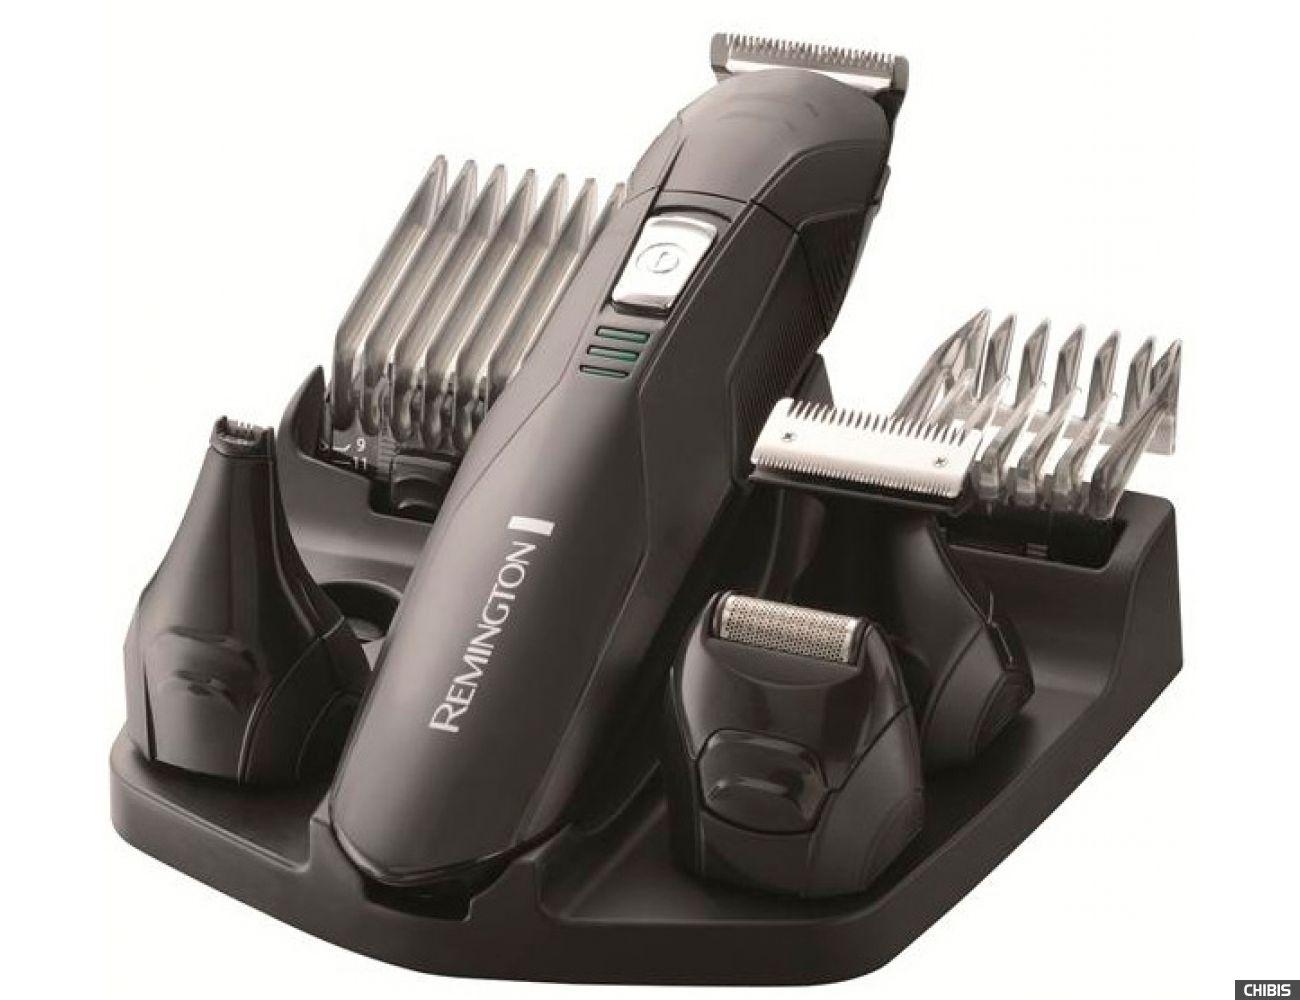 Комплект по уходу за волосами Remington PG6030